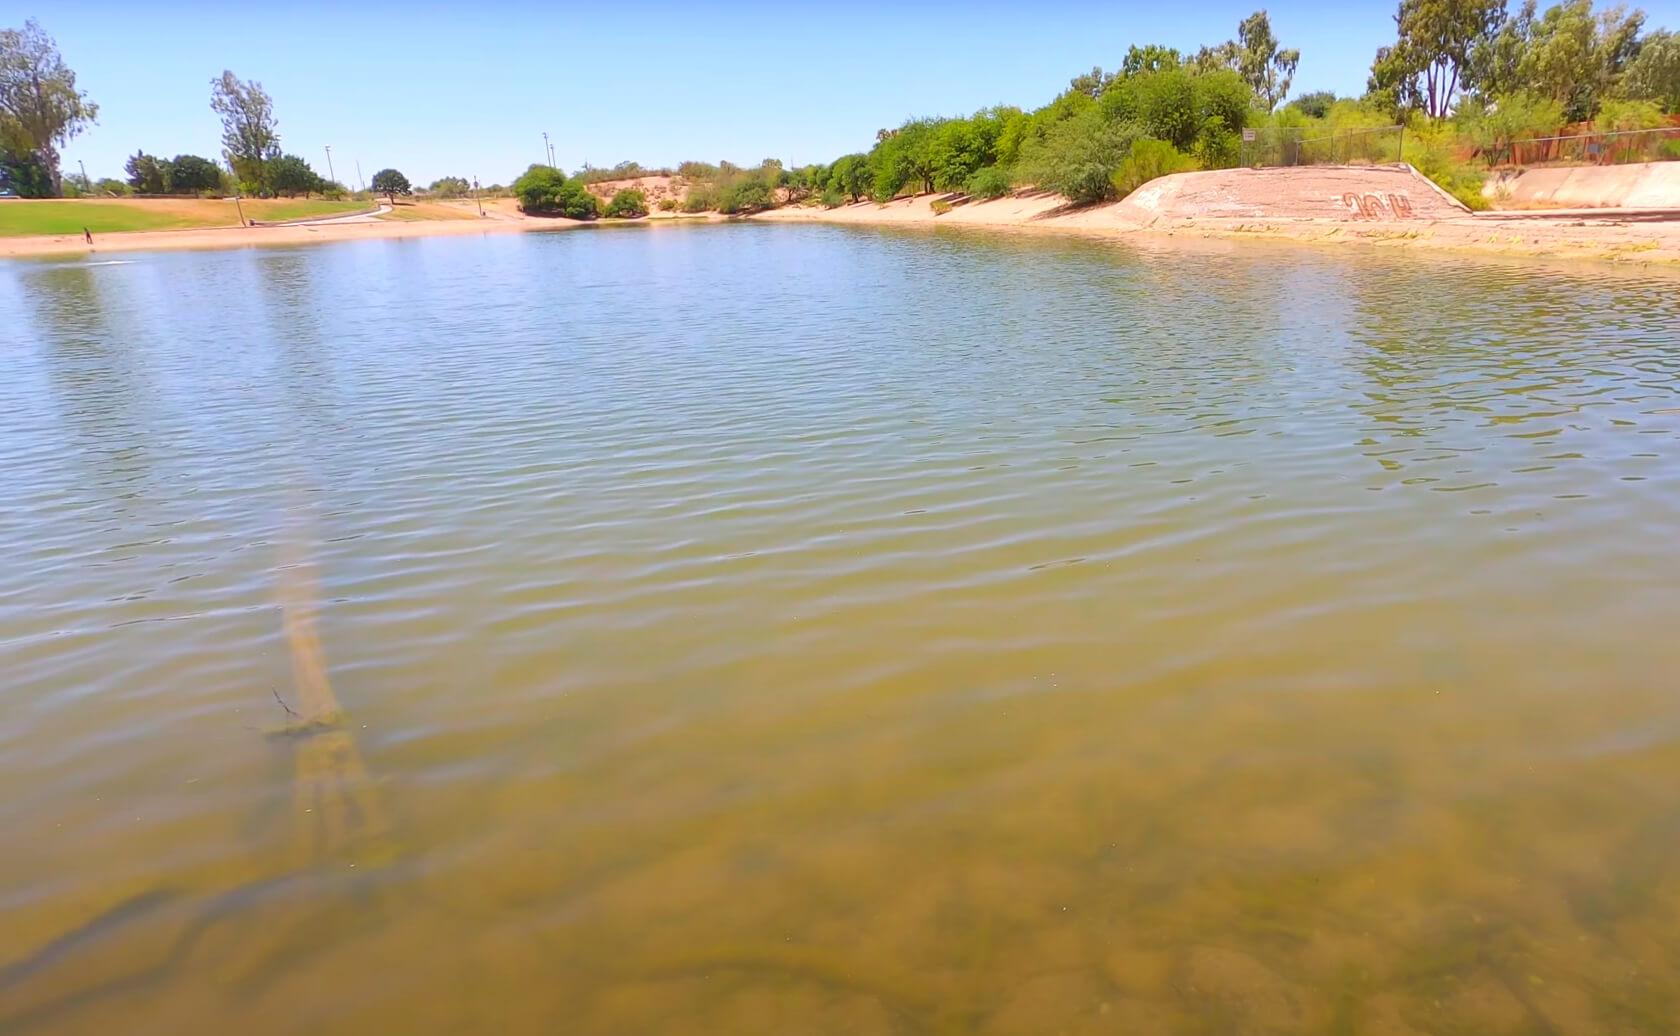 Lakeside-Lake-Fishing-Guide-Tucson-AZ-04